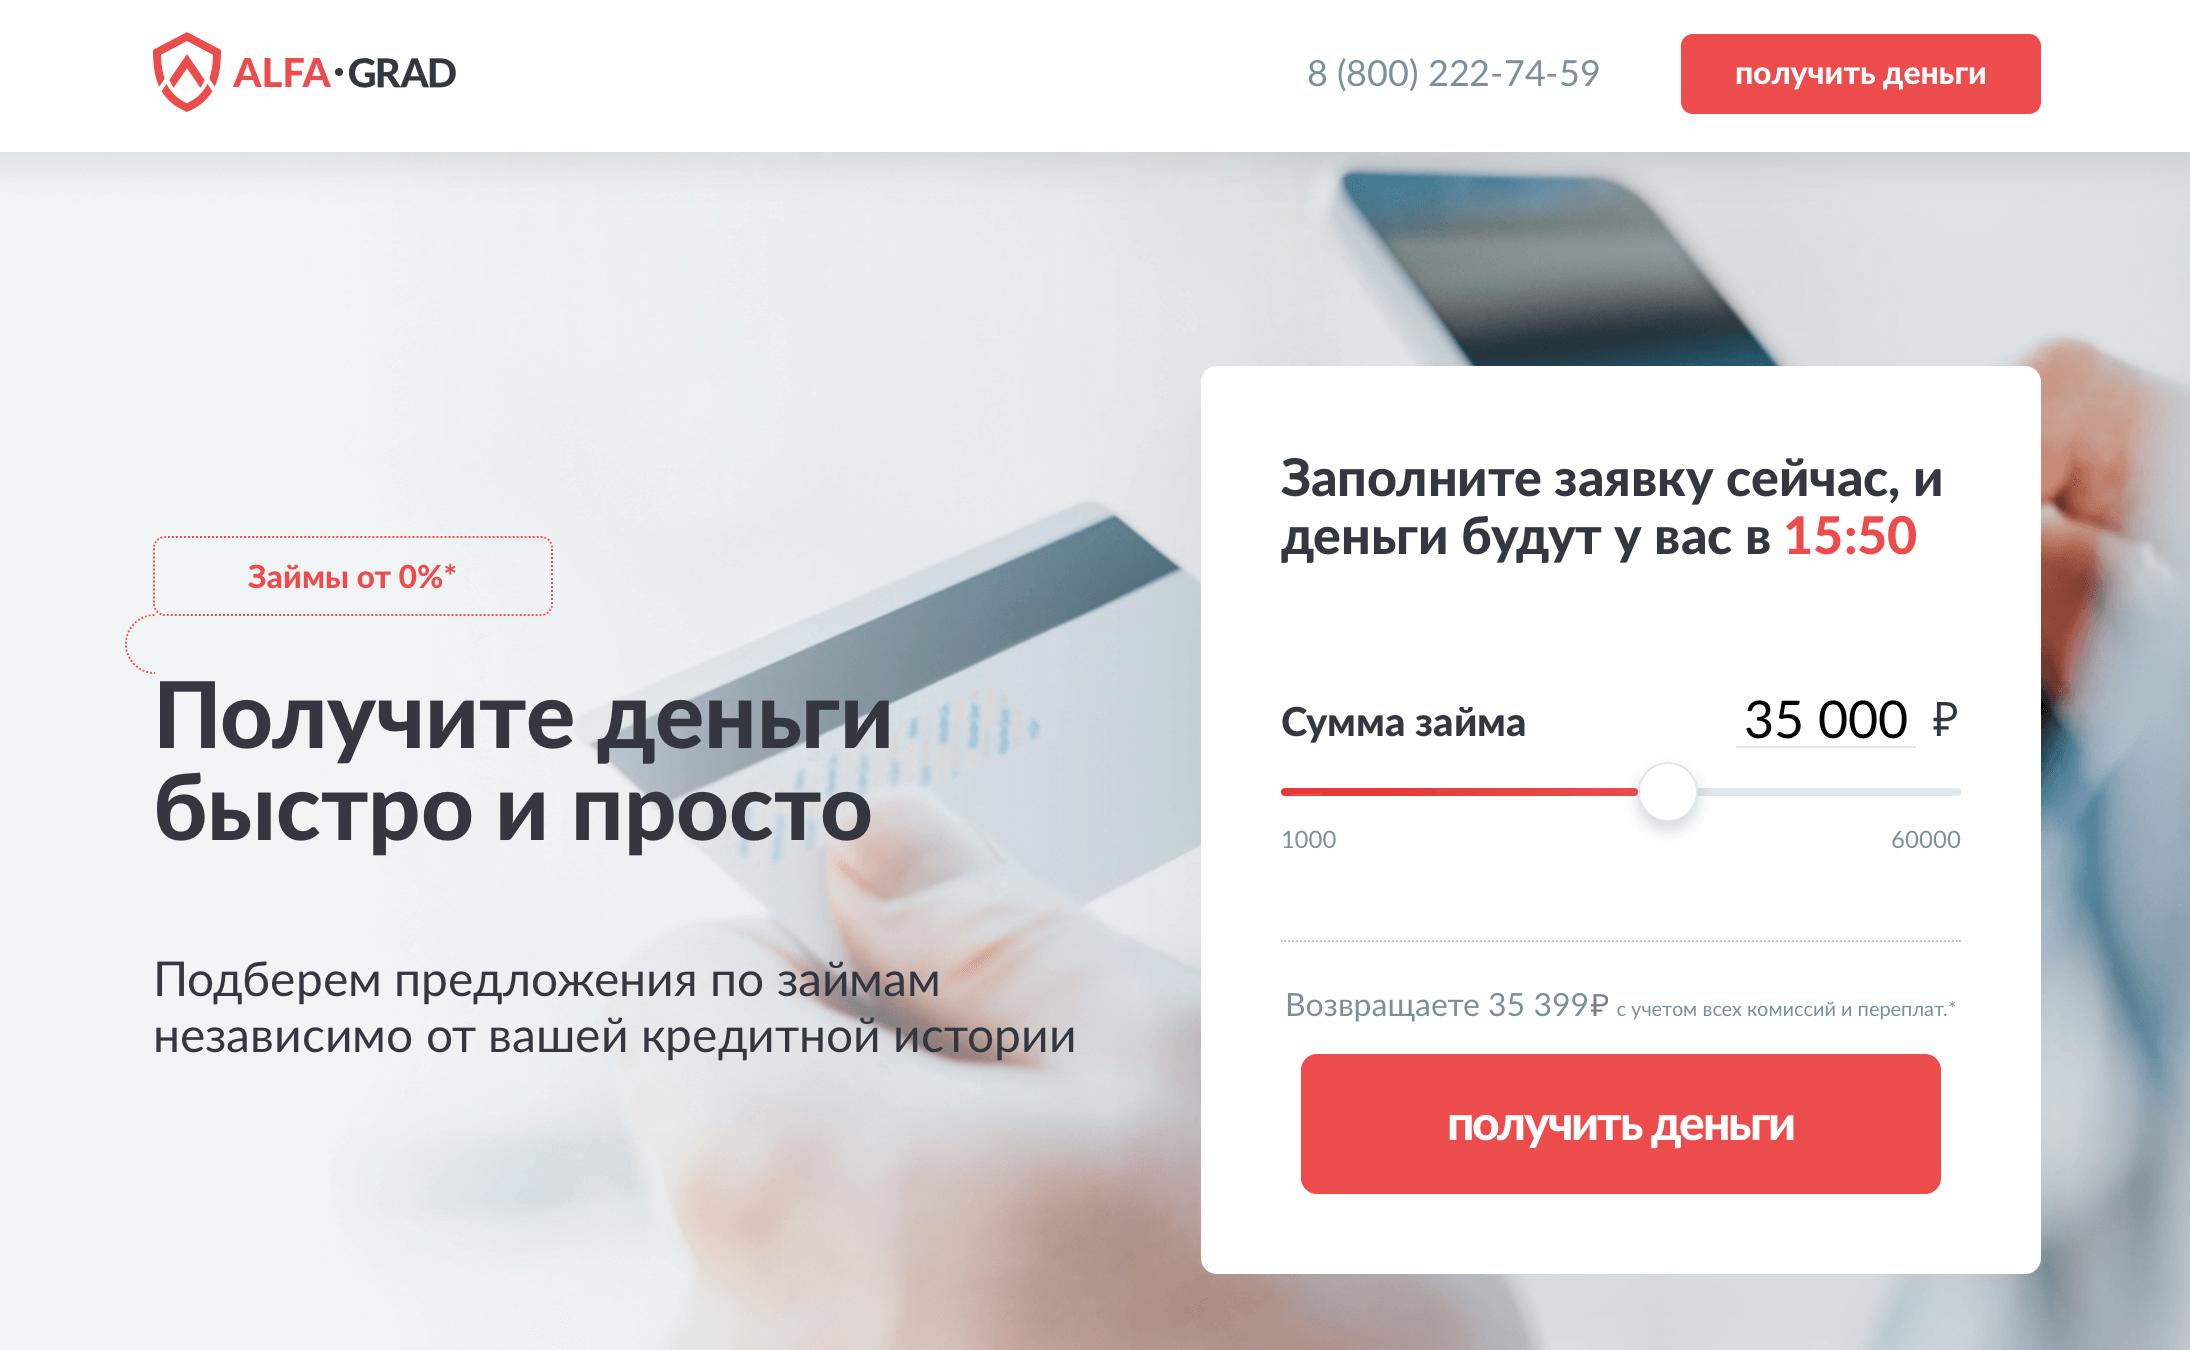 калькулятор расчета кредита банка открытие